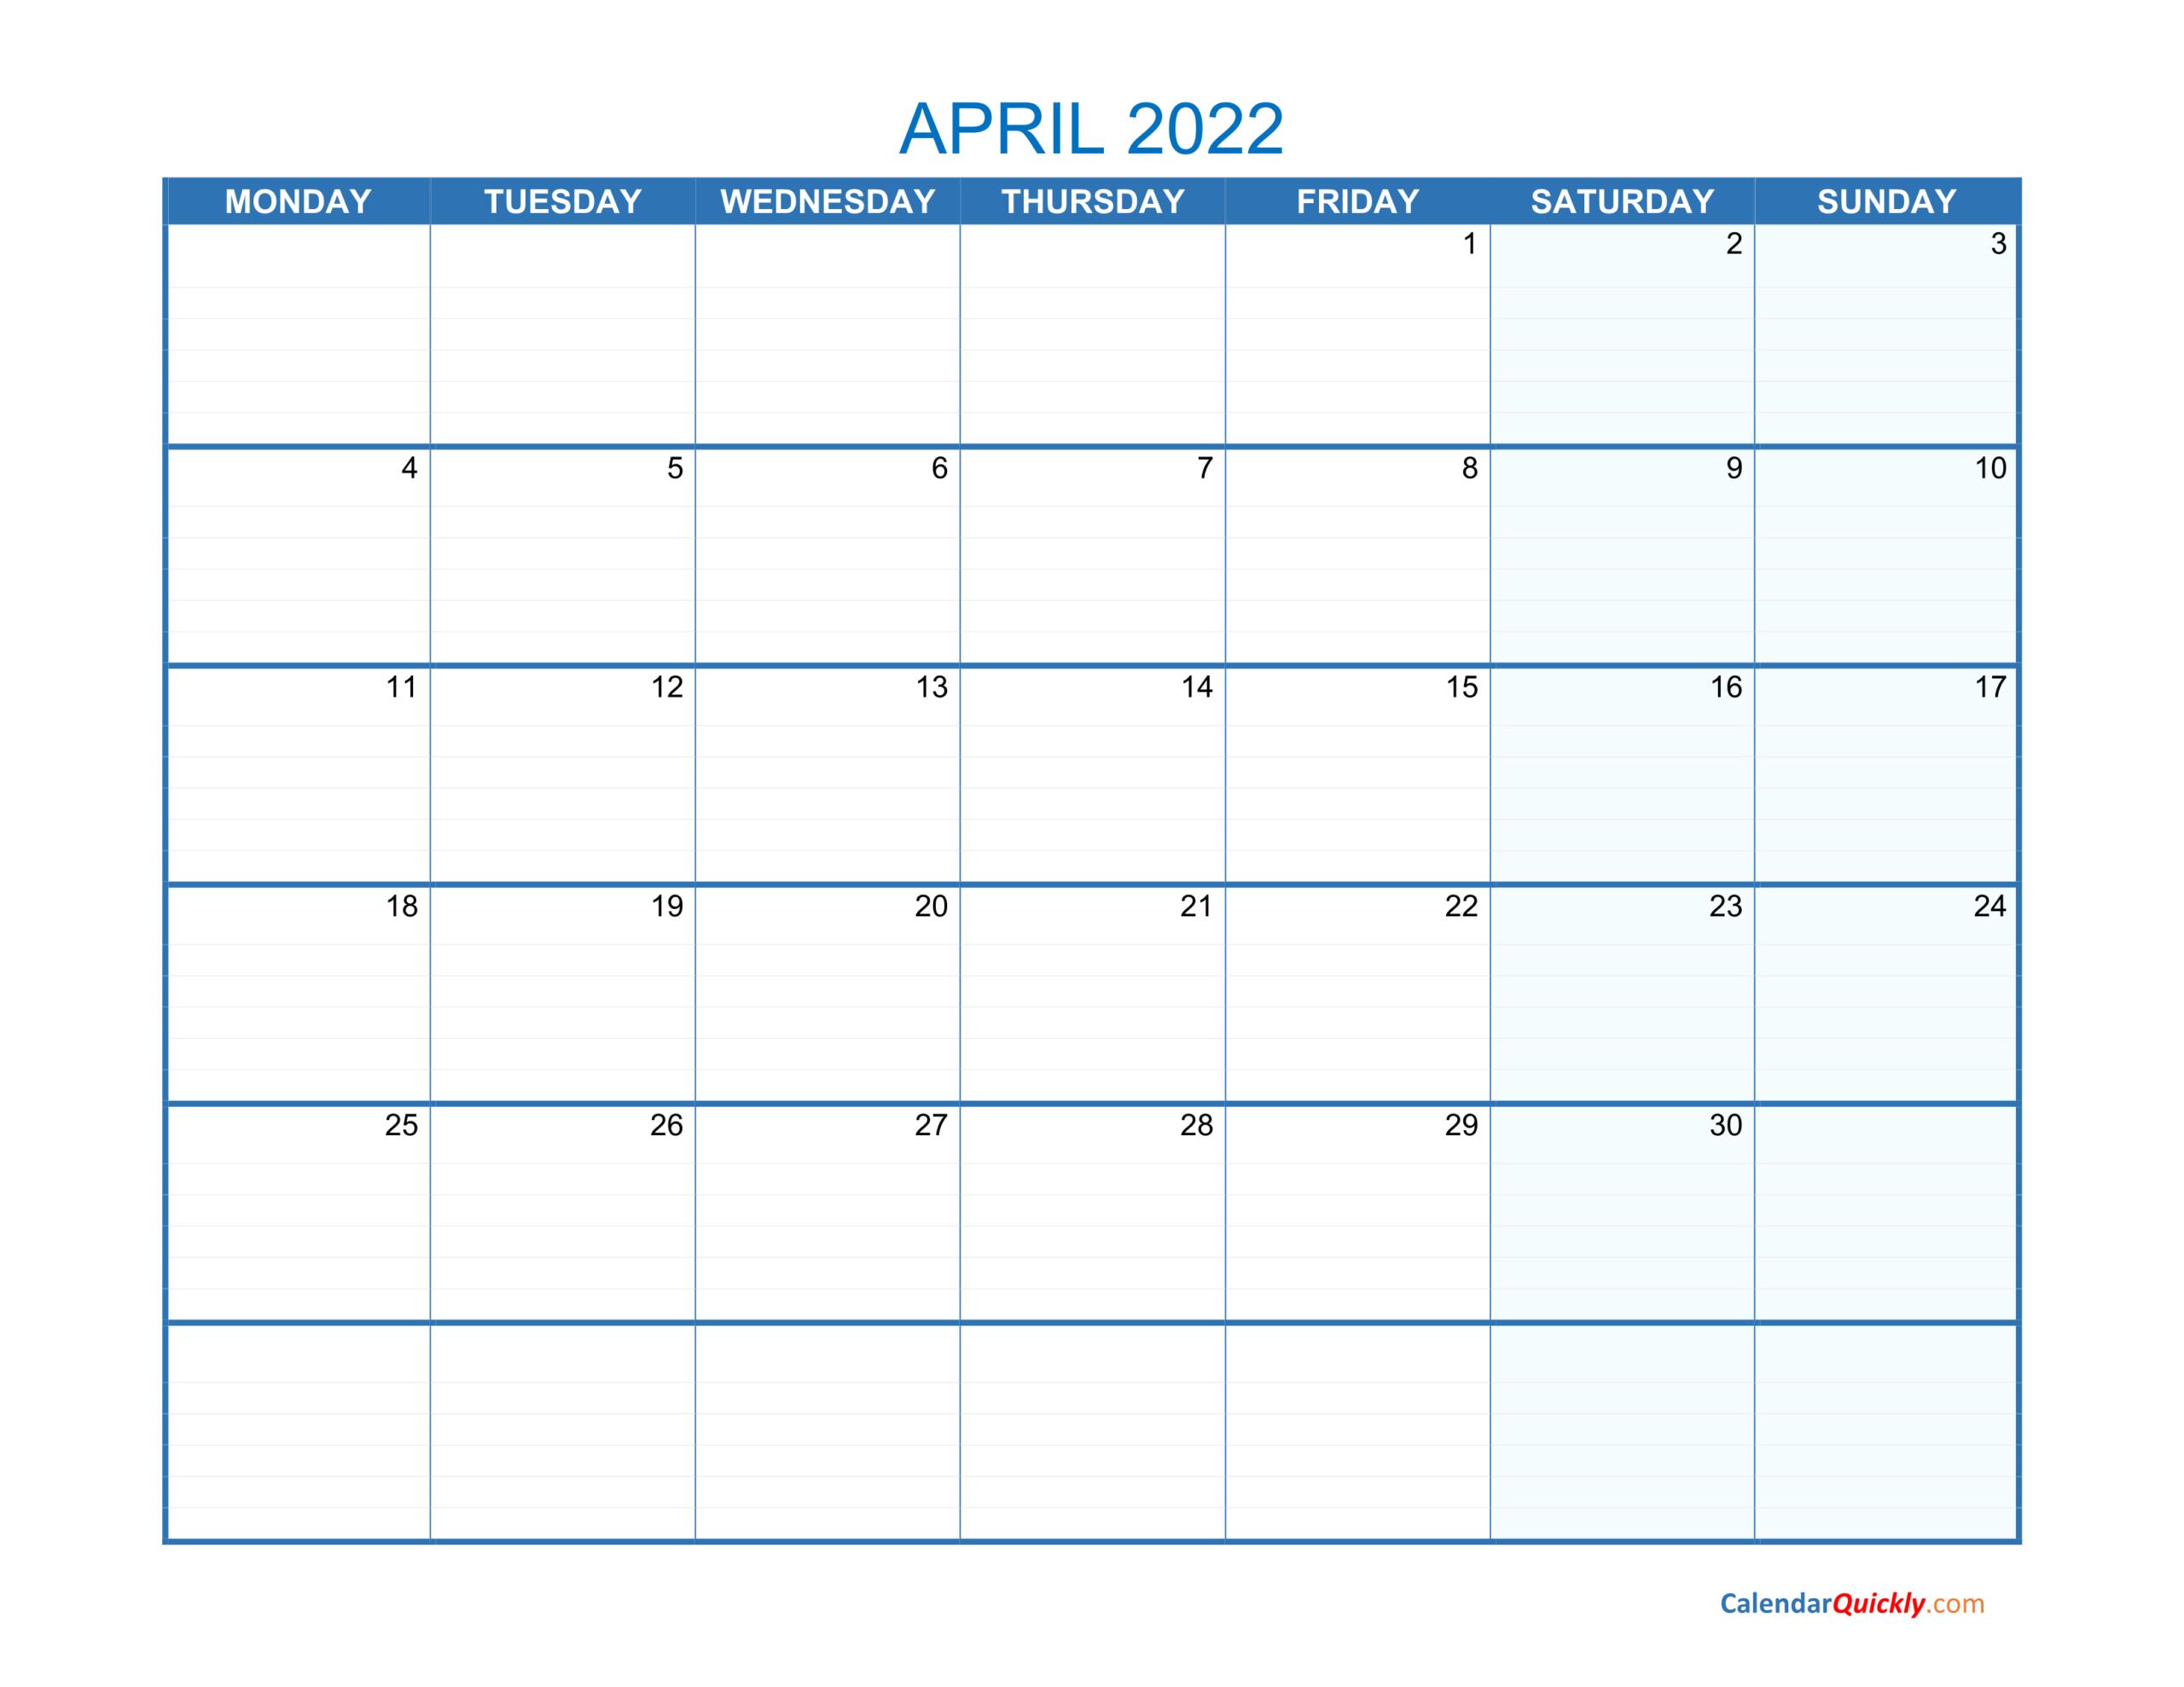 April Monday 2022 Blank Calendar